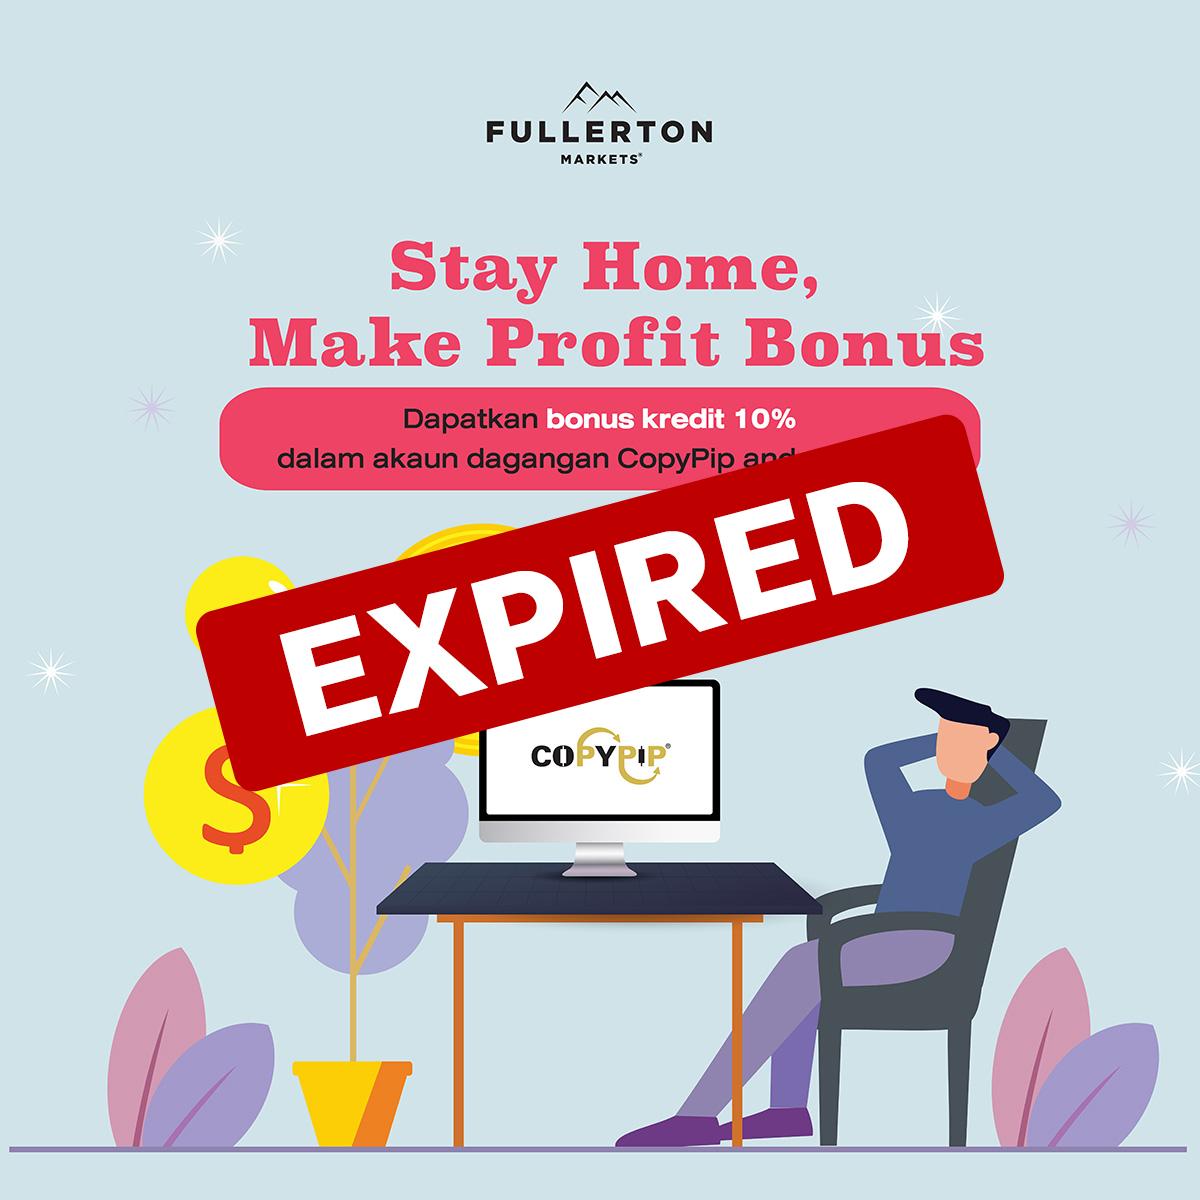 EXPIRED-MS_Stay Home Bonus_1200x1200